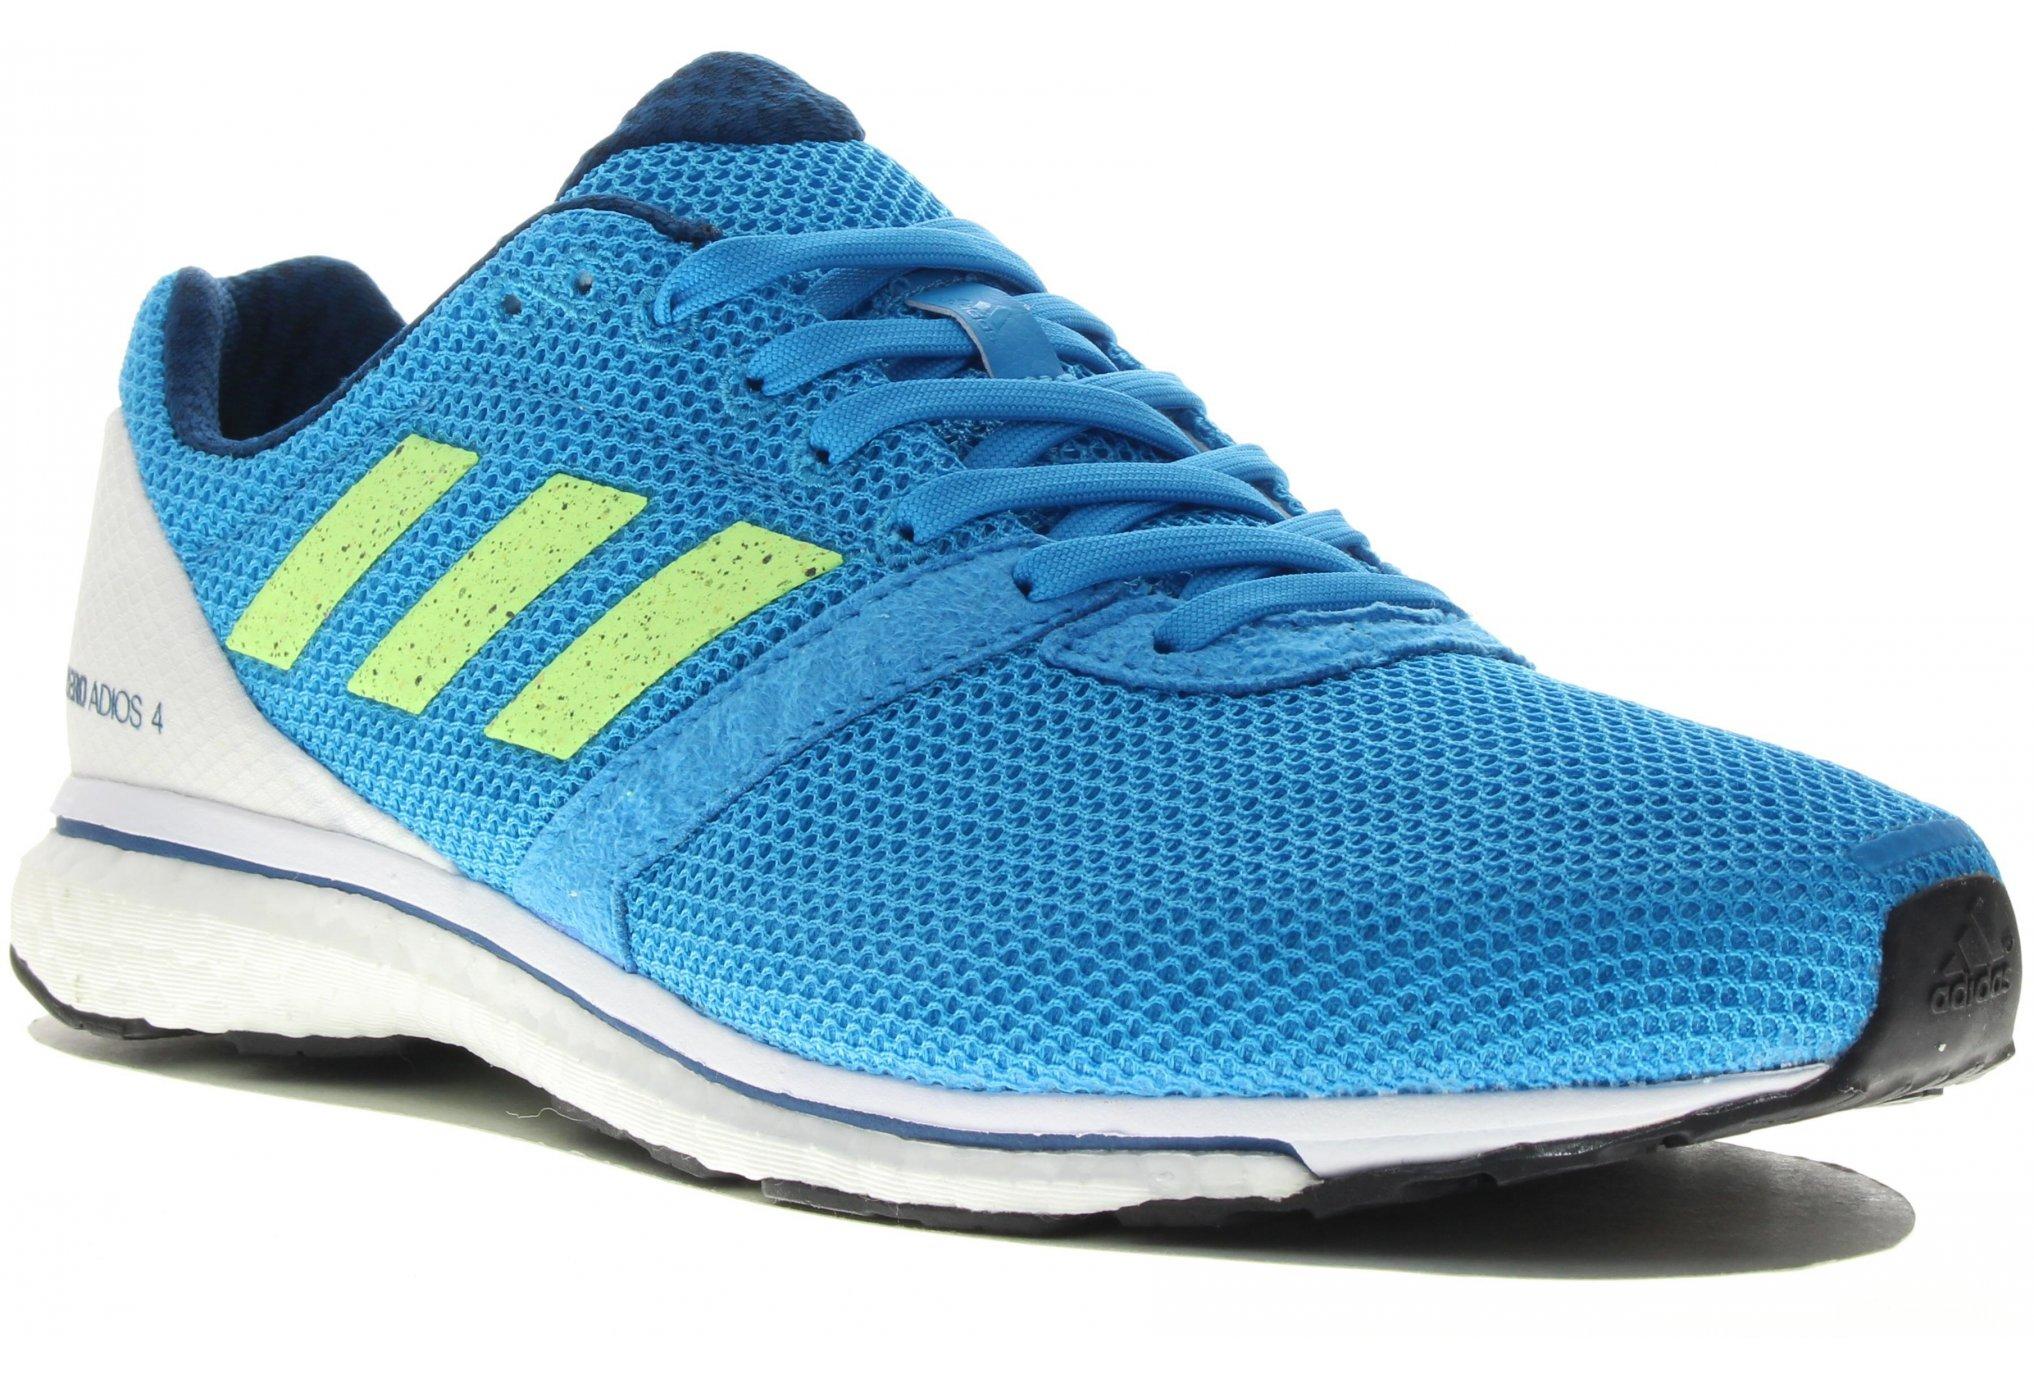 Adidas Adizero adios boost 4 m chaussures homme